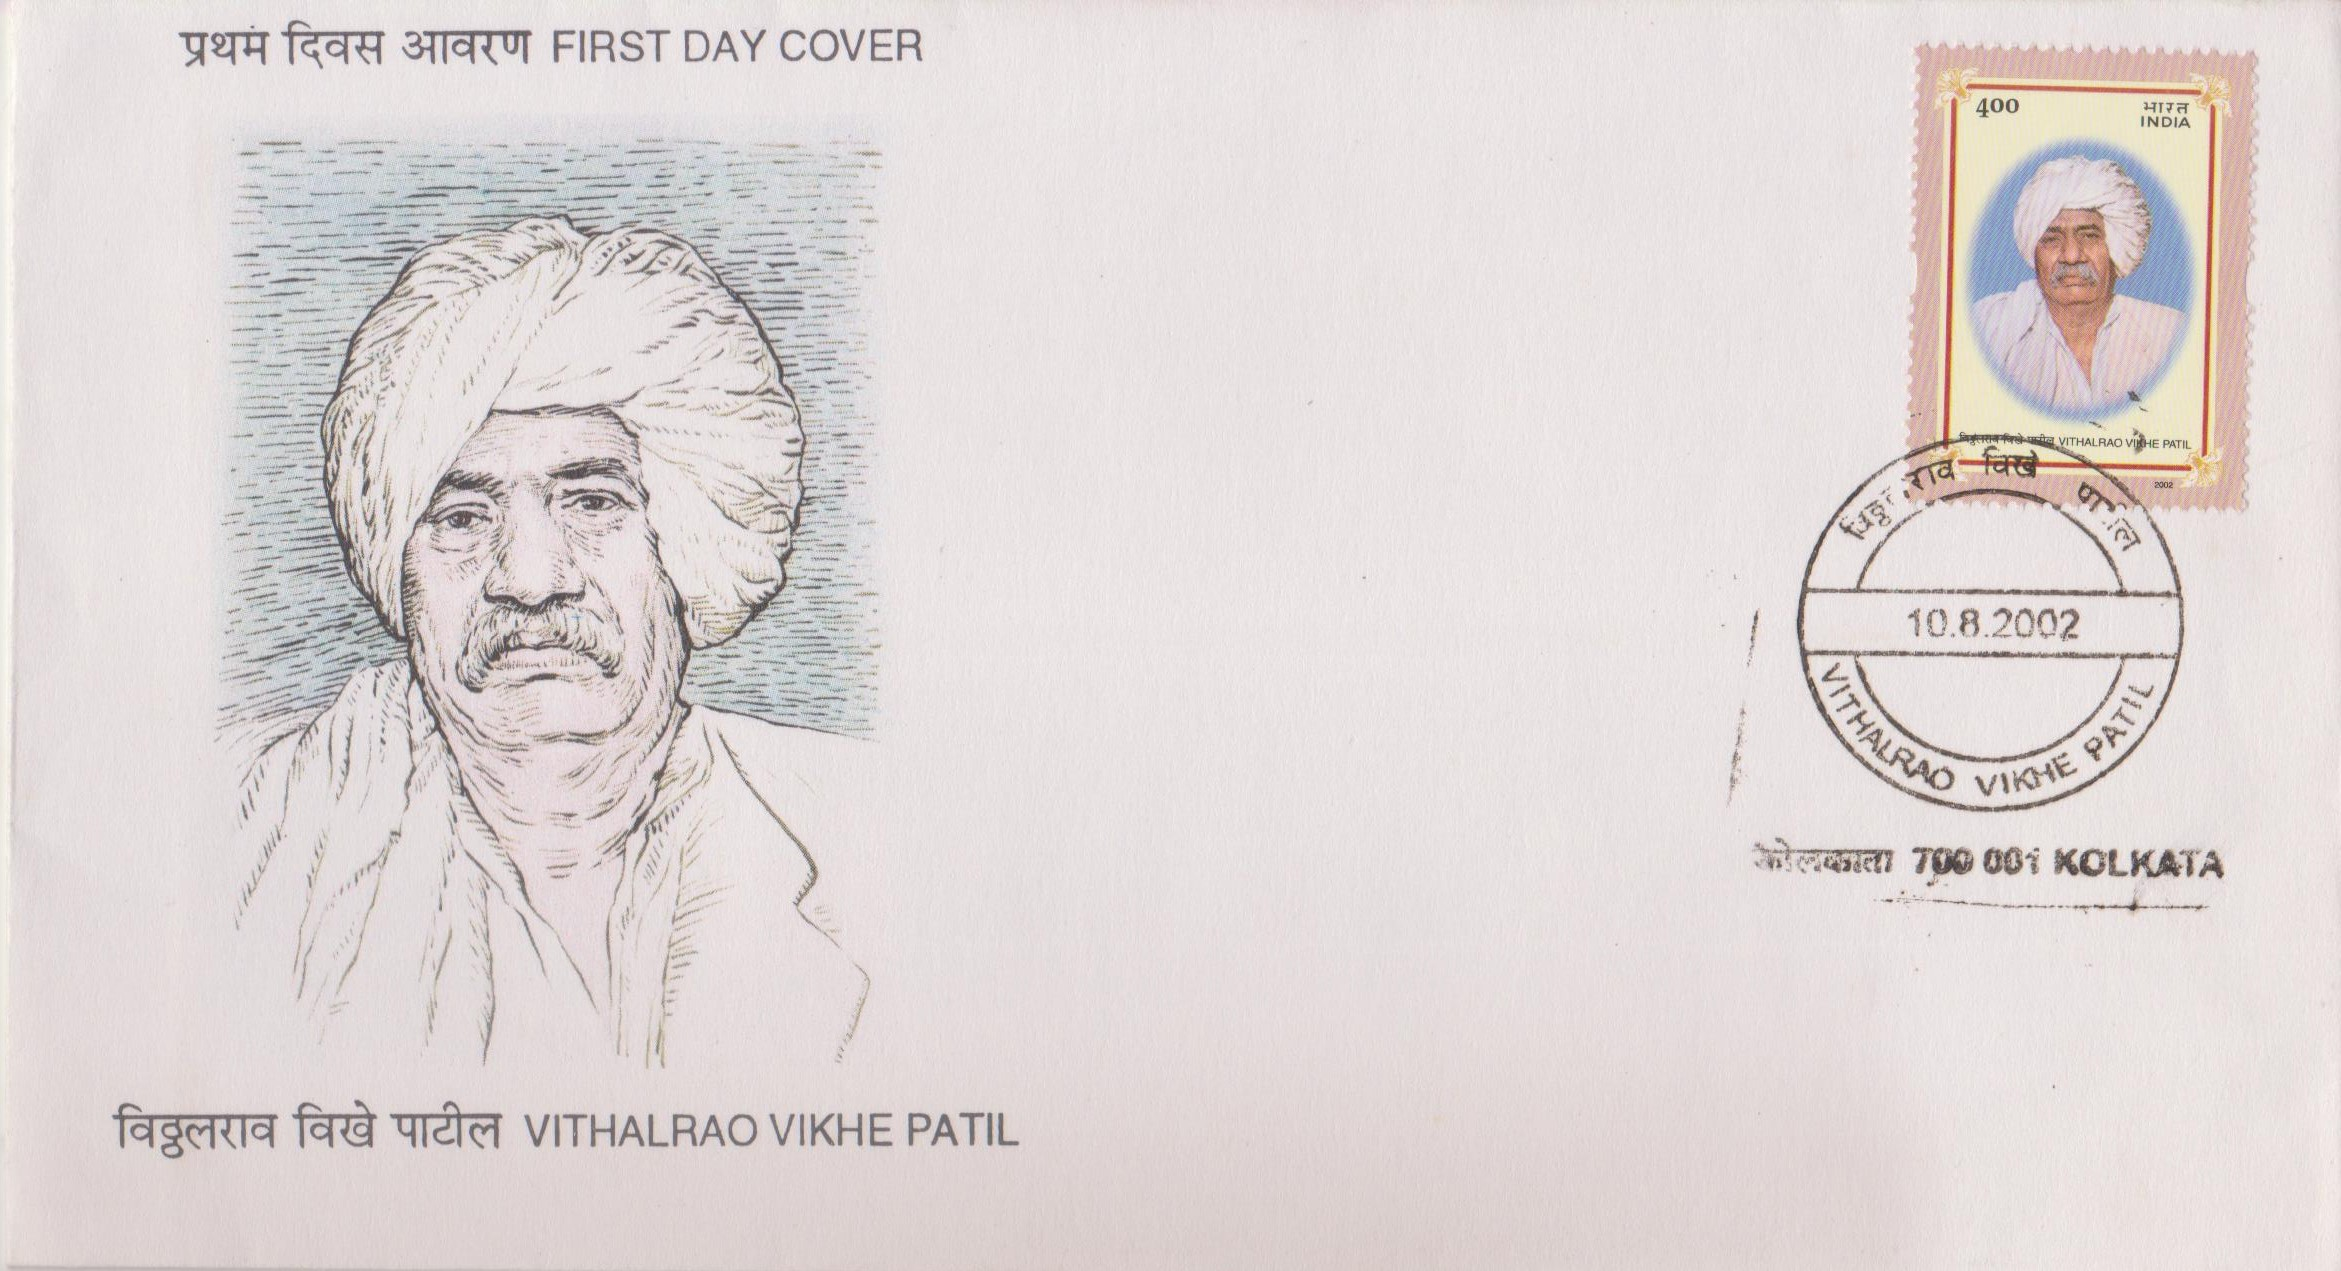 V.V. Patil (विठ्ठलराव विखे पाटील) : farmers' cooperative movement